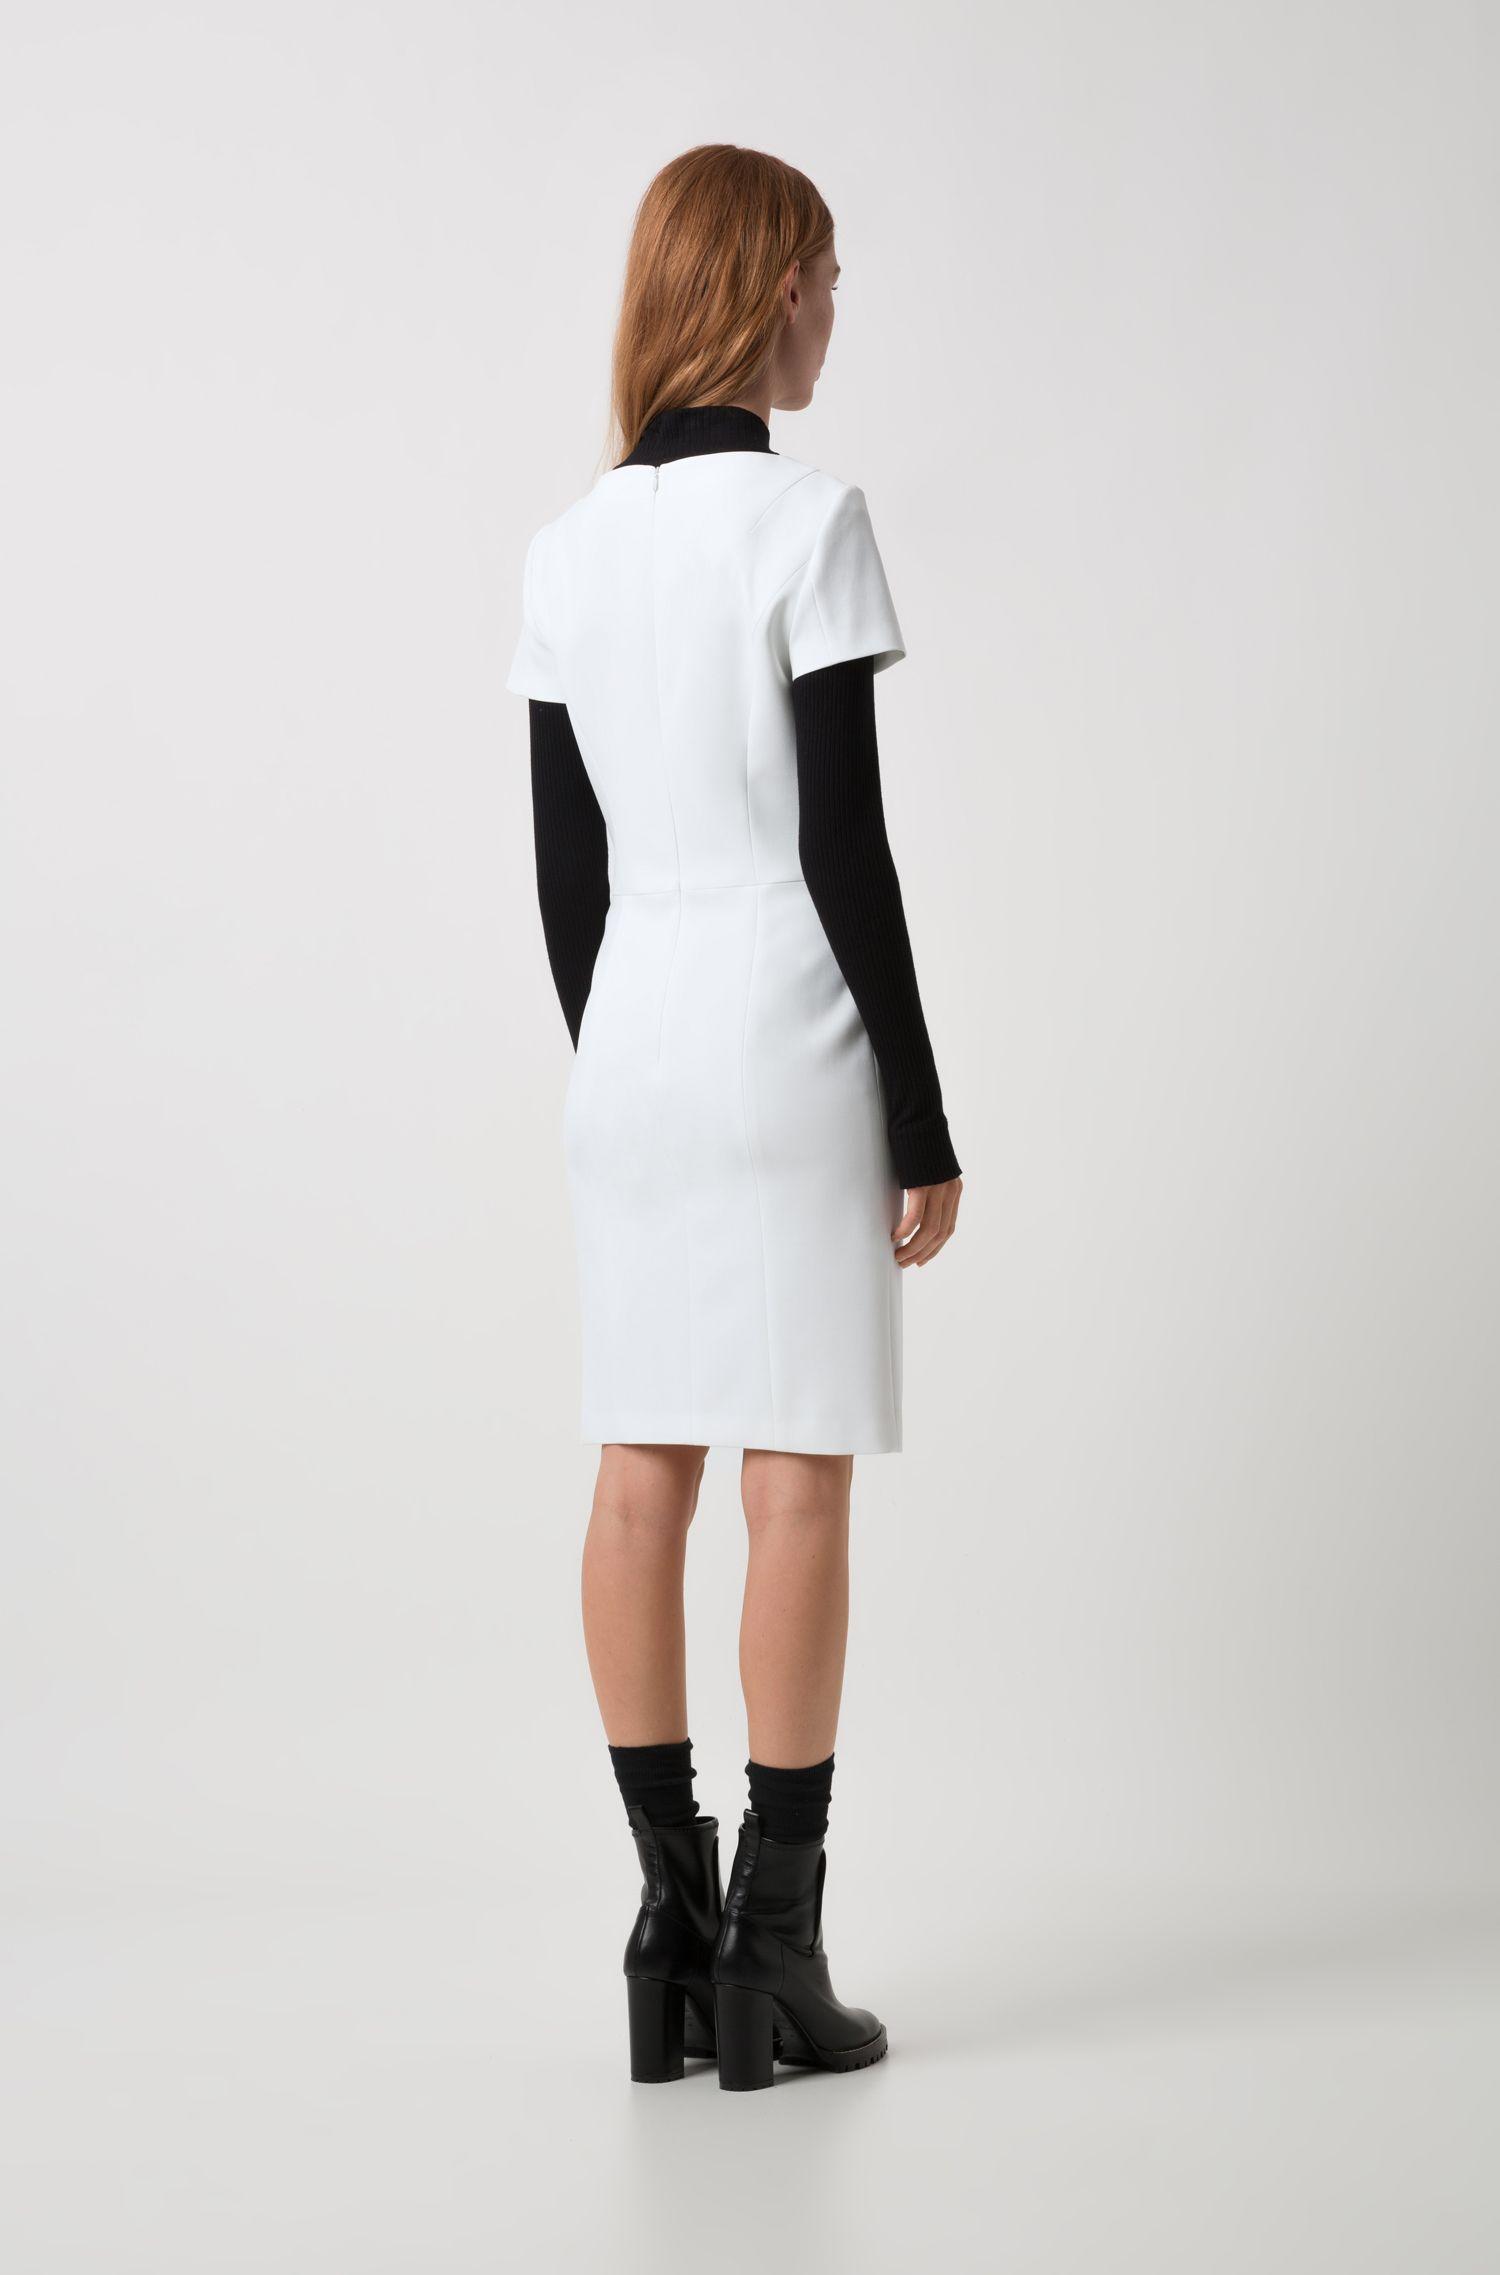 Robe business cintrée à manches courtes, en tissu stretch, Chair